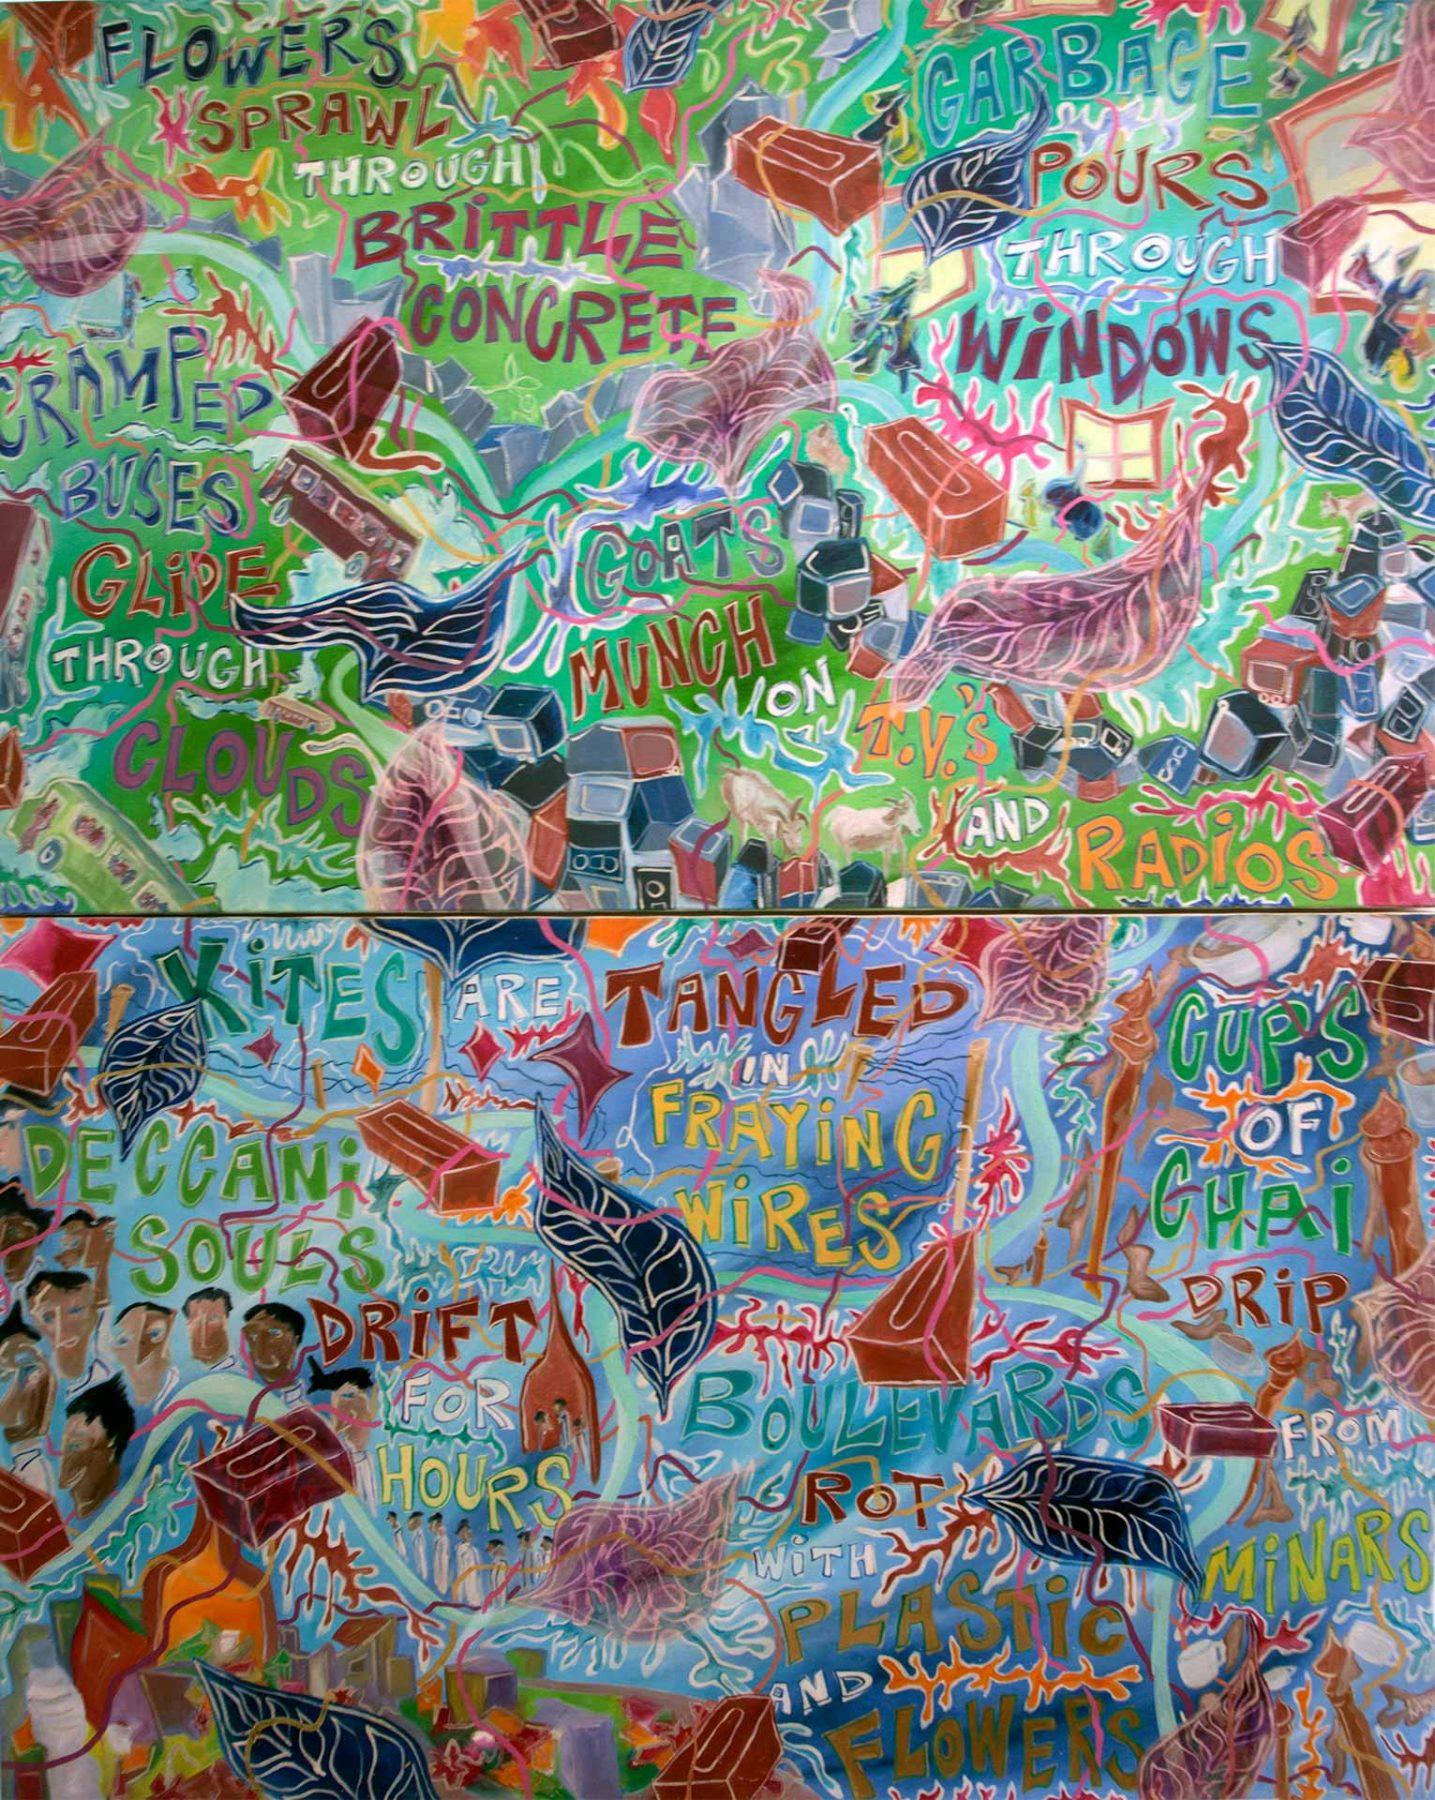 Deccani Souls (2007) oil on canvas (2 panels) 1.52H x 1.22W meters